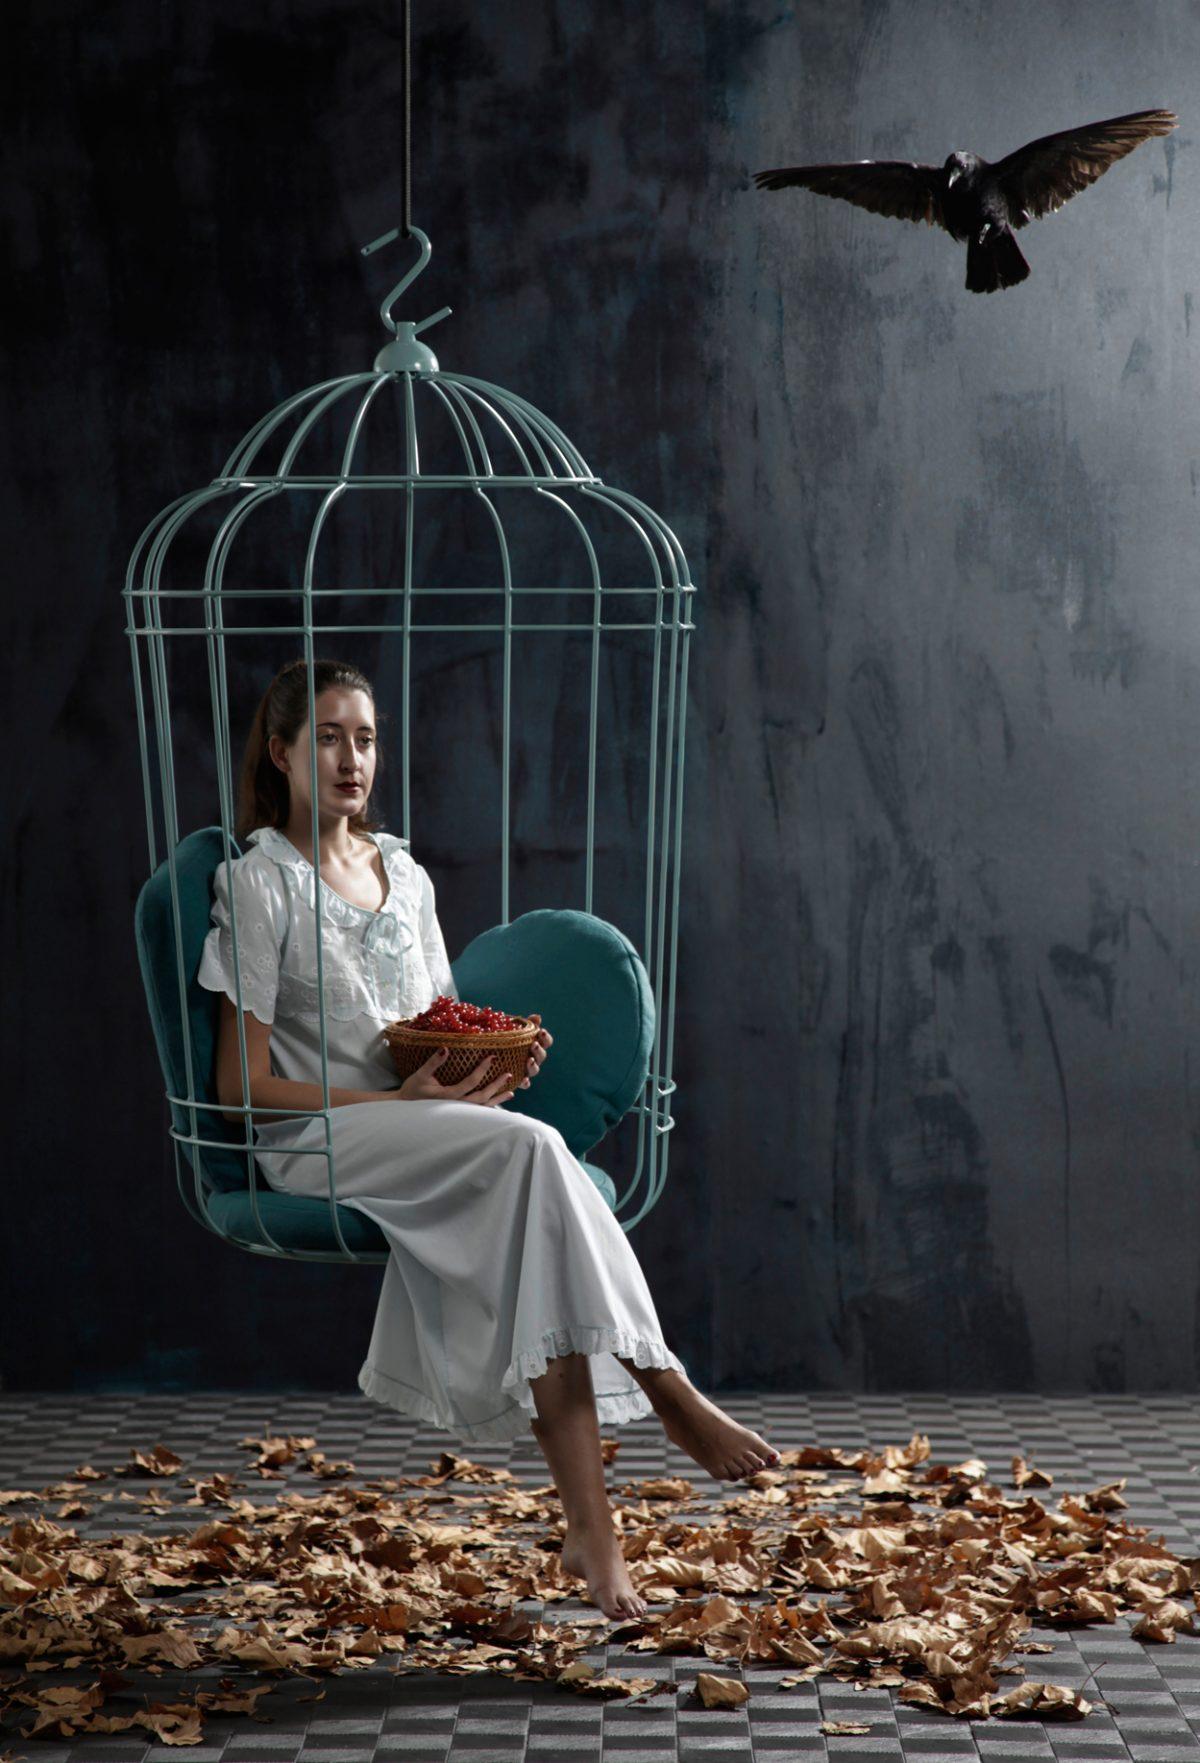 Cageling hangstoel – Ontwerpduo hanging chair